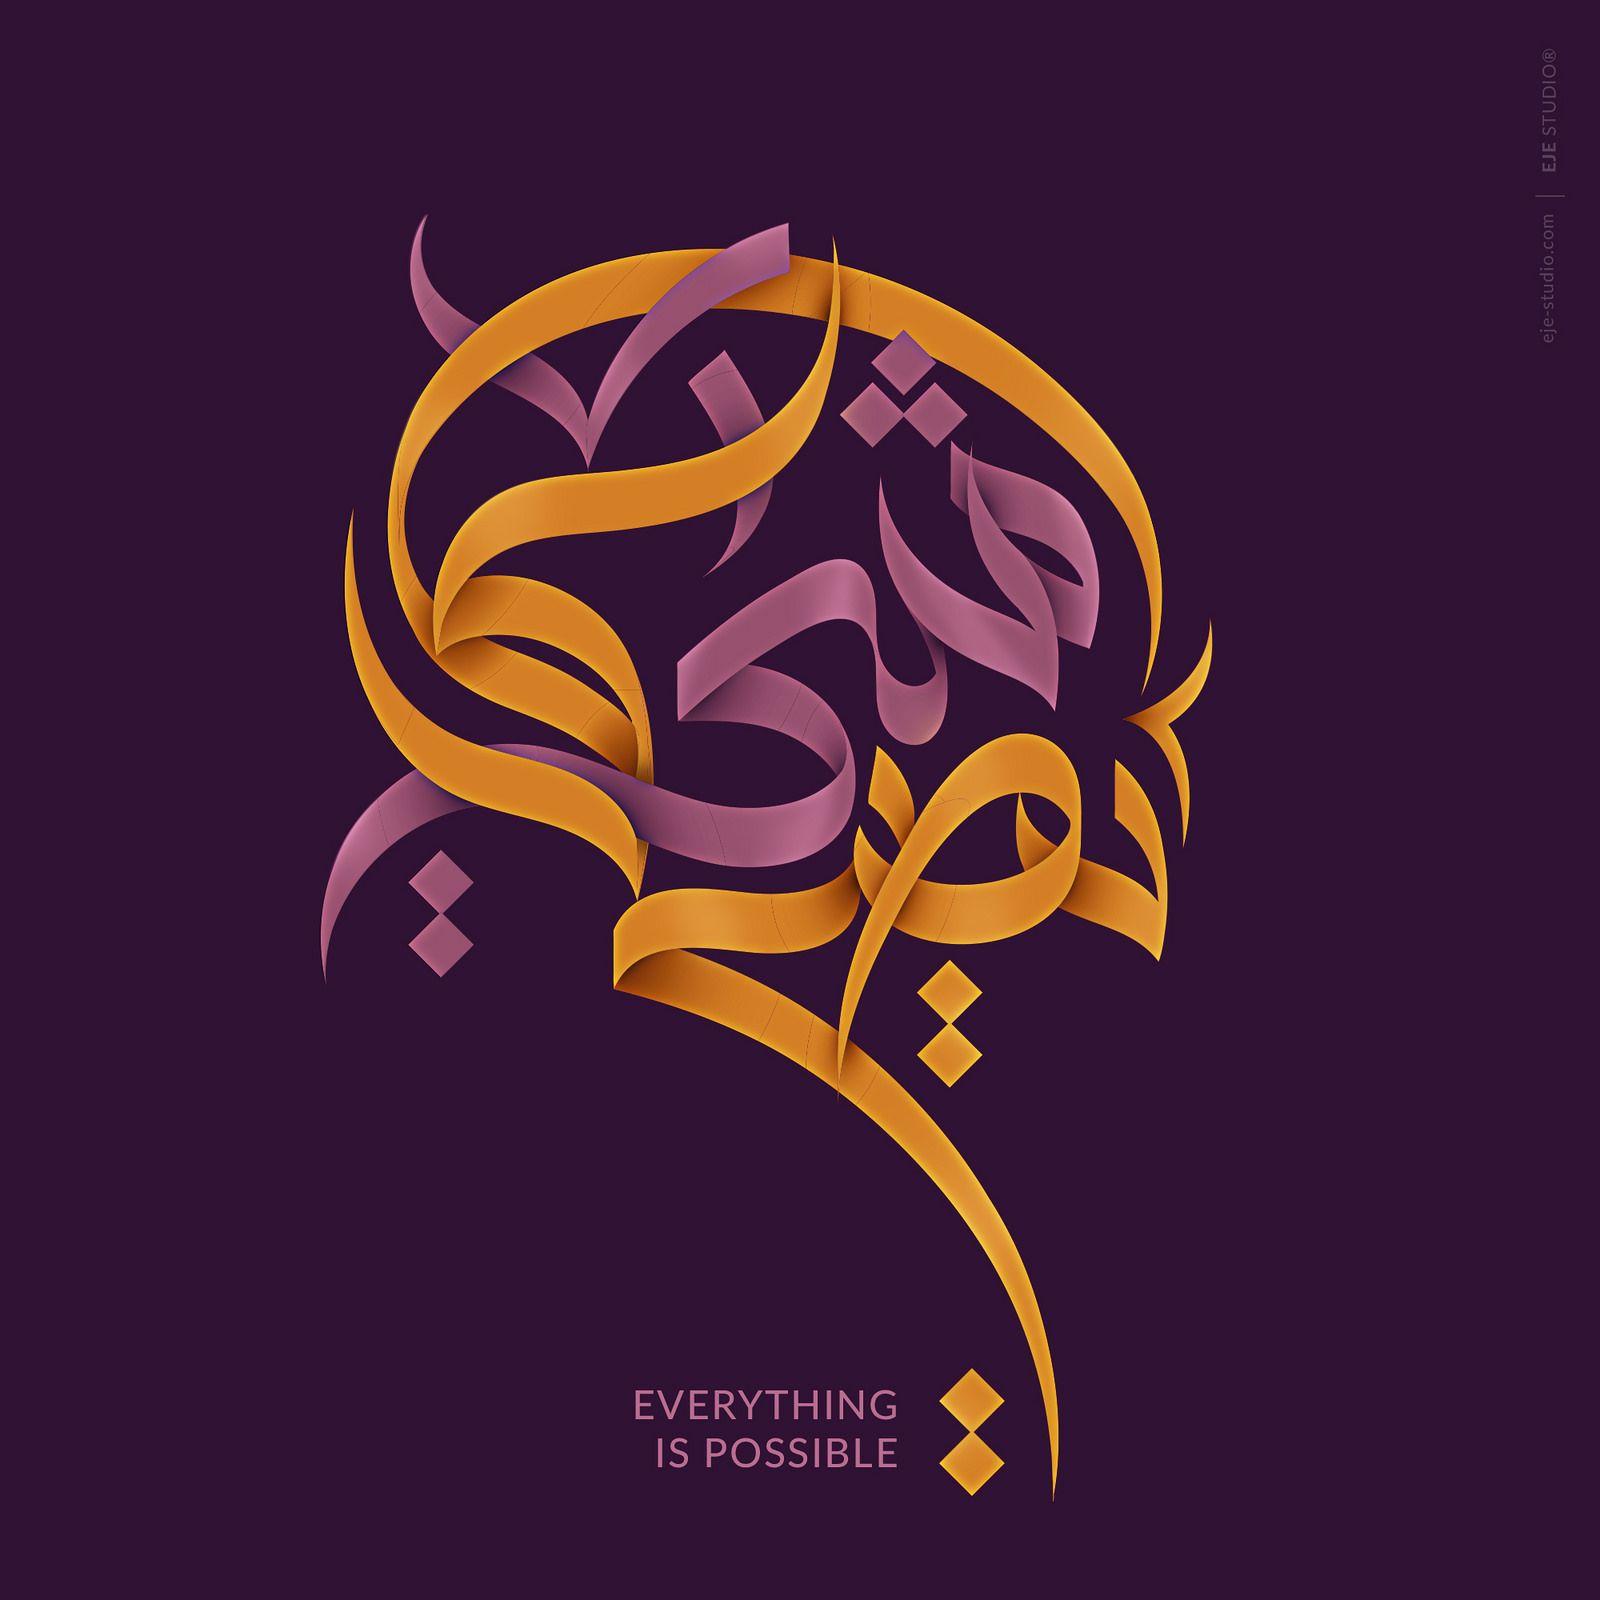 Modern Arabic Calligraphy By Eje Studio Ebrahim Jaffar Arabic Calligraphy Arabic Calligraphy Design Caligraphy Art